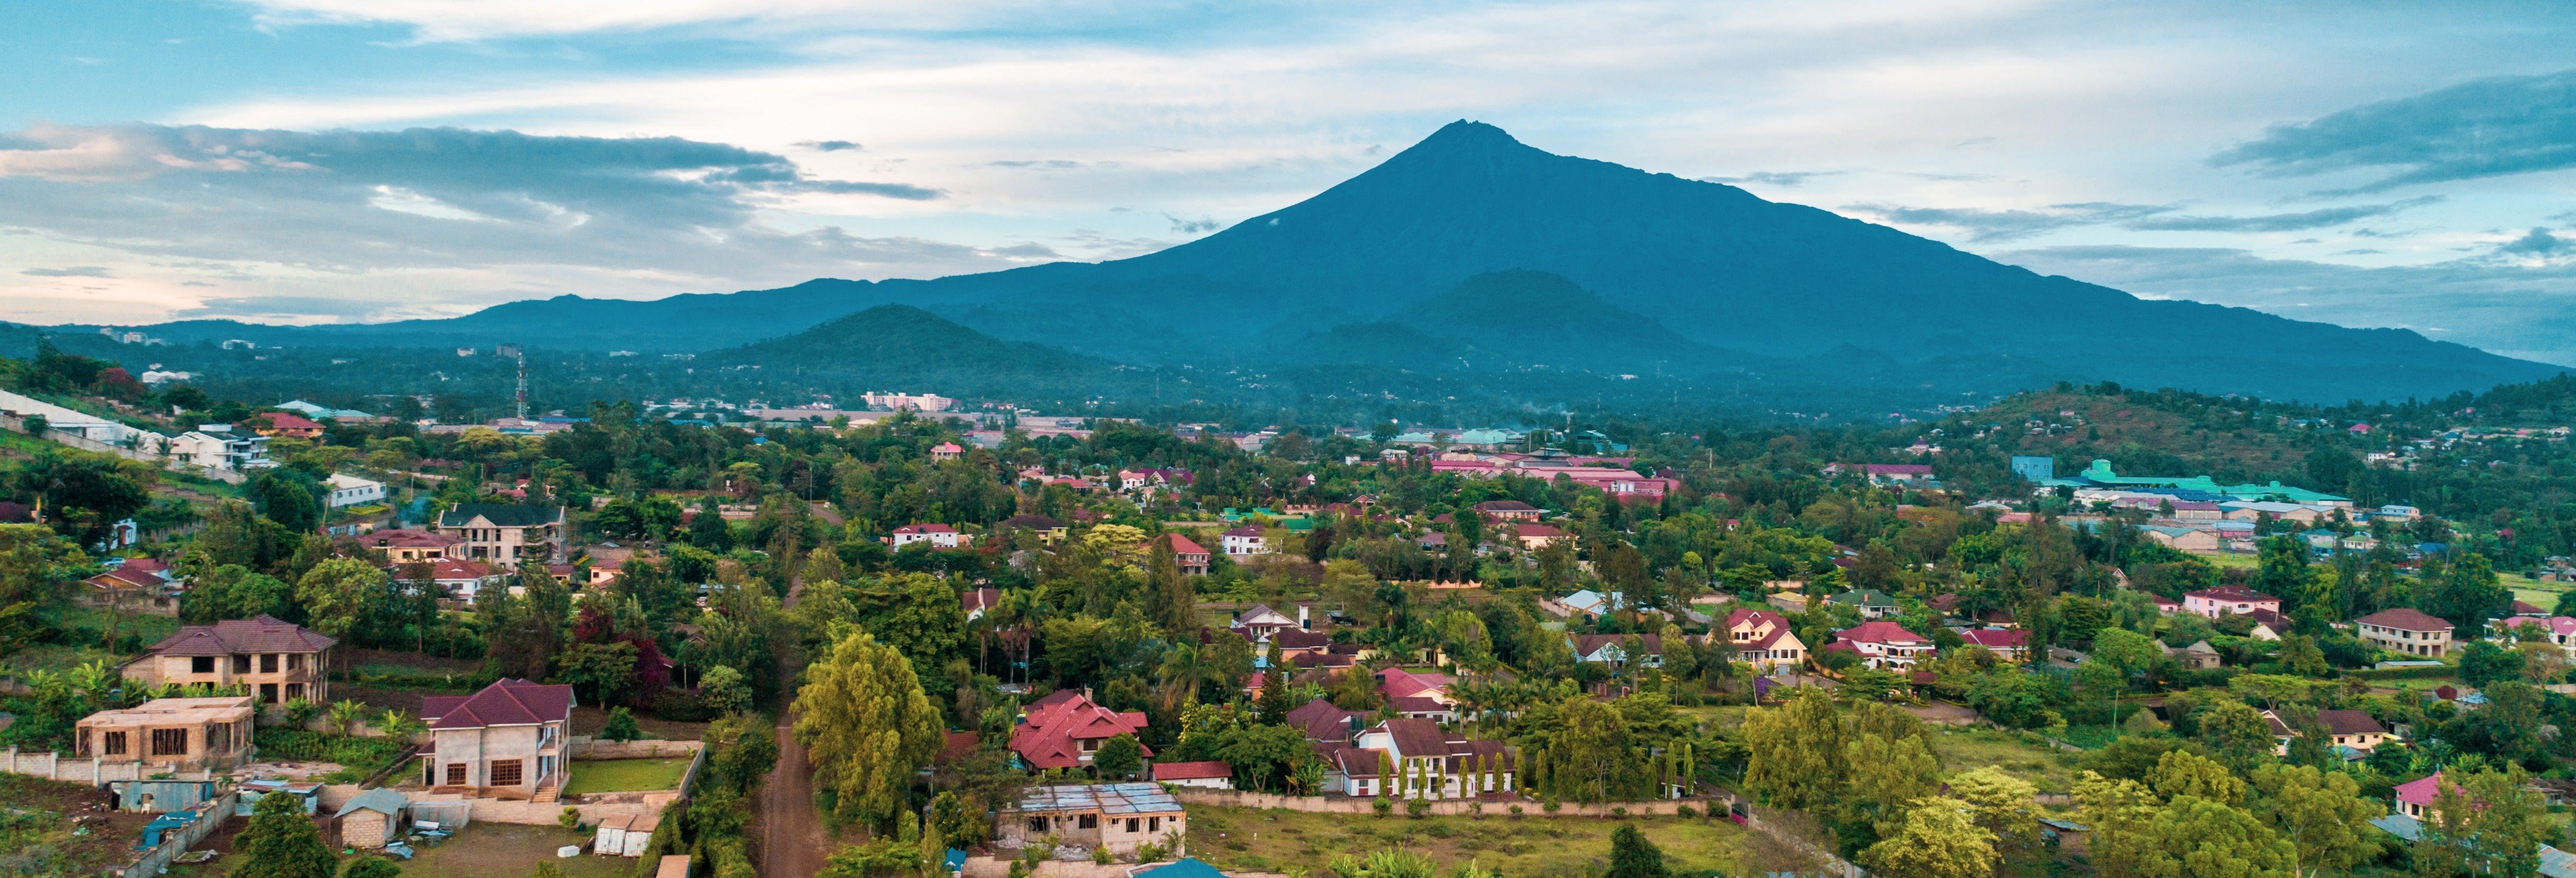 Visita guiada por Arusha